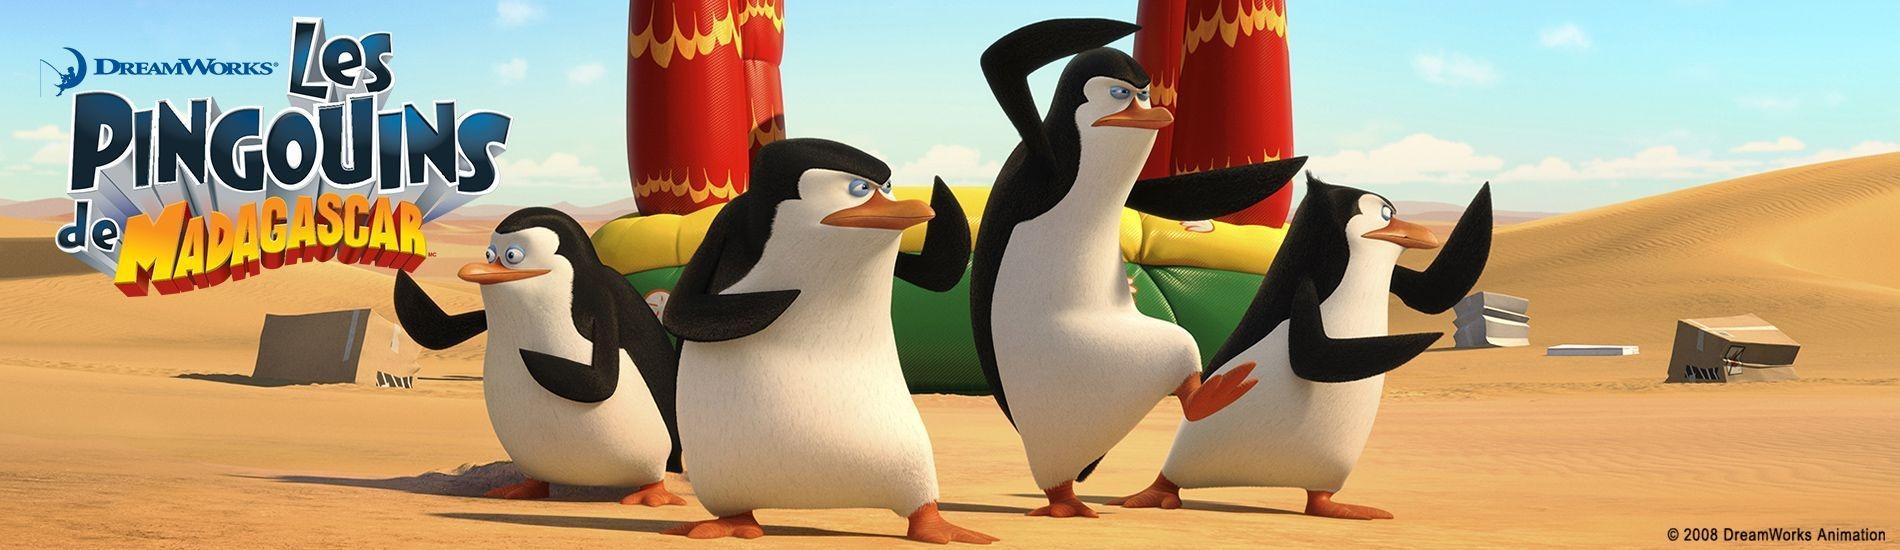 Les Pingouins de Madagascar en streaming sur Gulli Replay